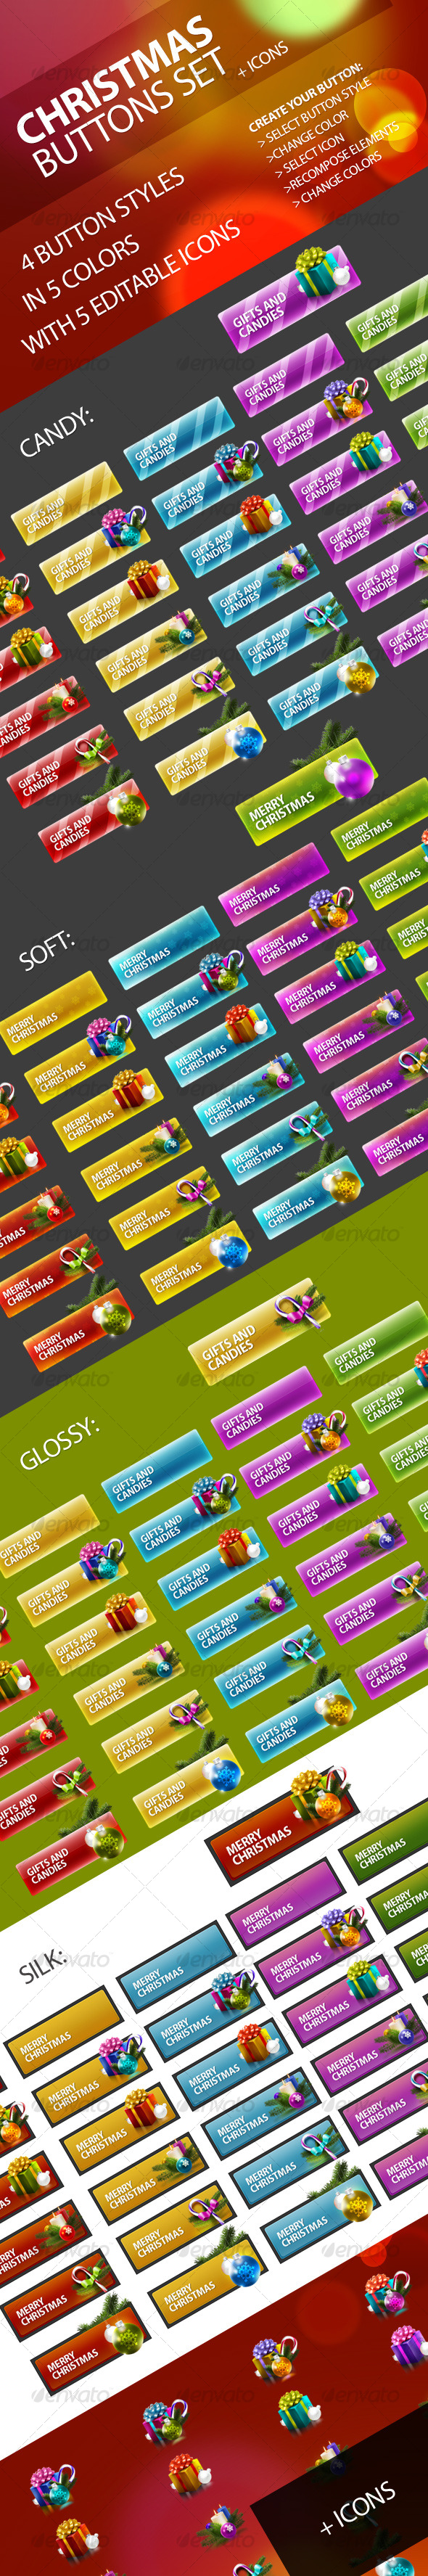 GraphicRiver Christmas Buttons Set 131397